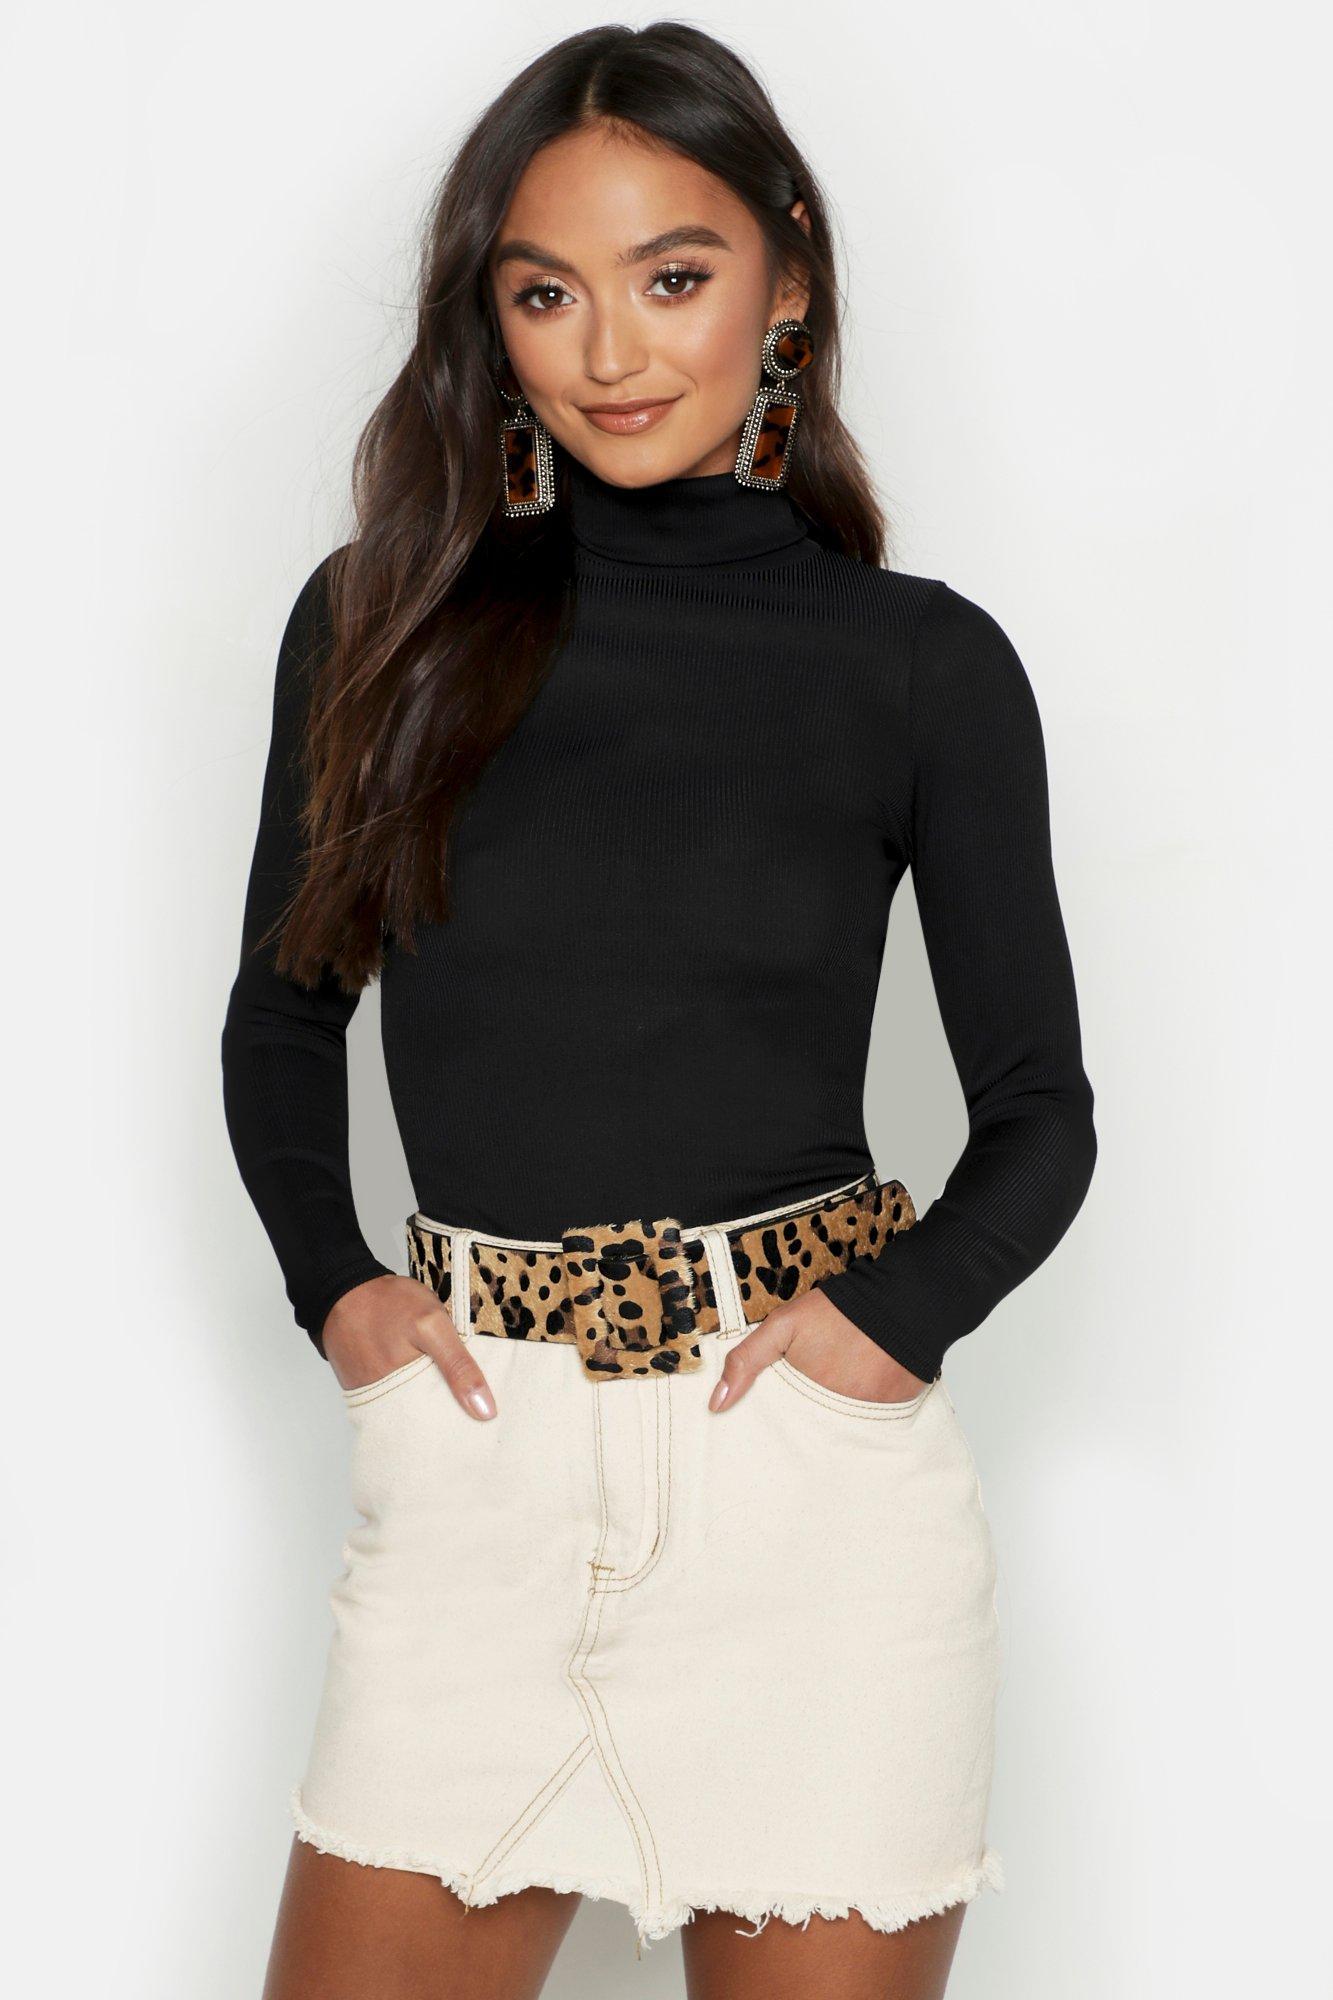 Womens Petite Geripptes Strick-Poloshirt aus glänzendem Jersey - schwarz - 38, Schwarz - Boohoo.com